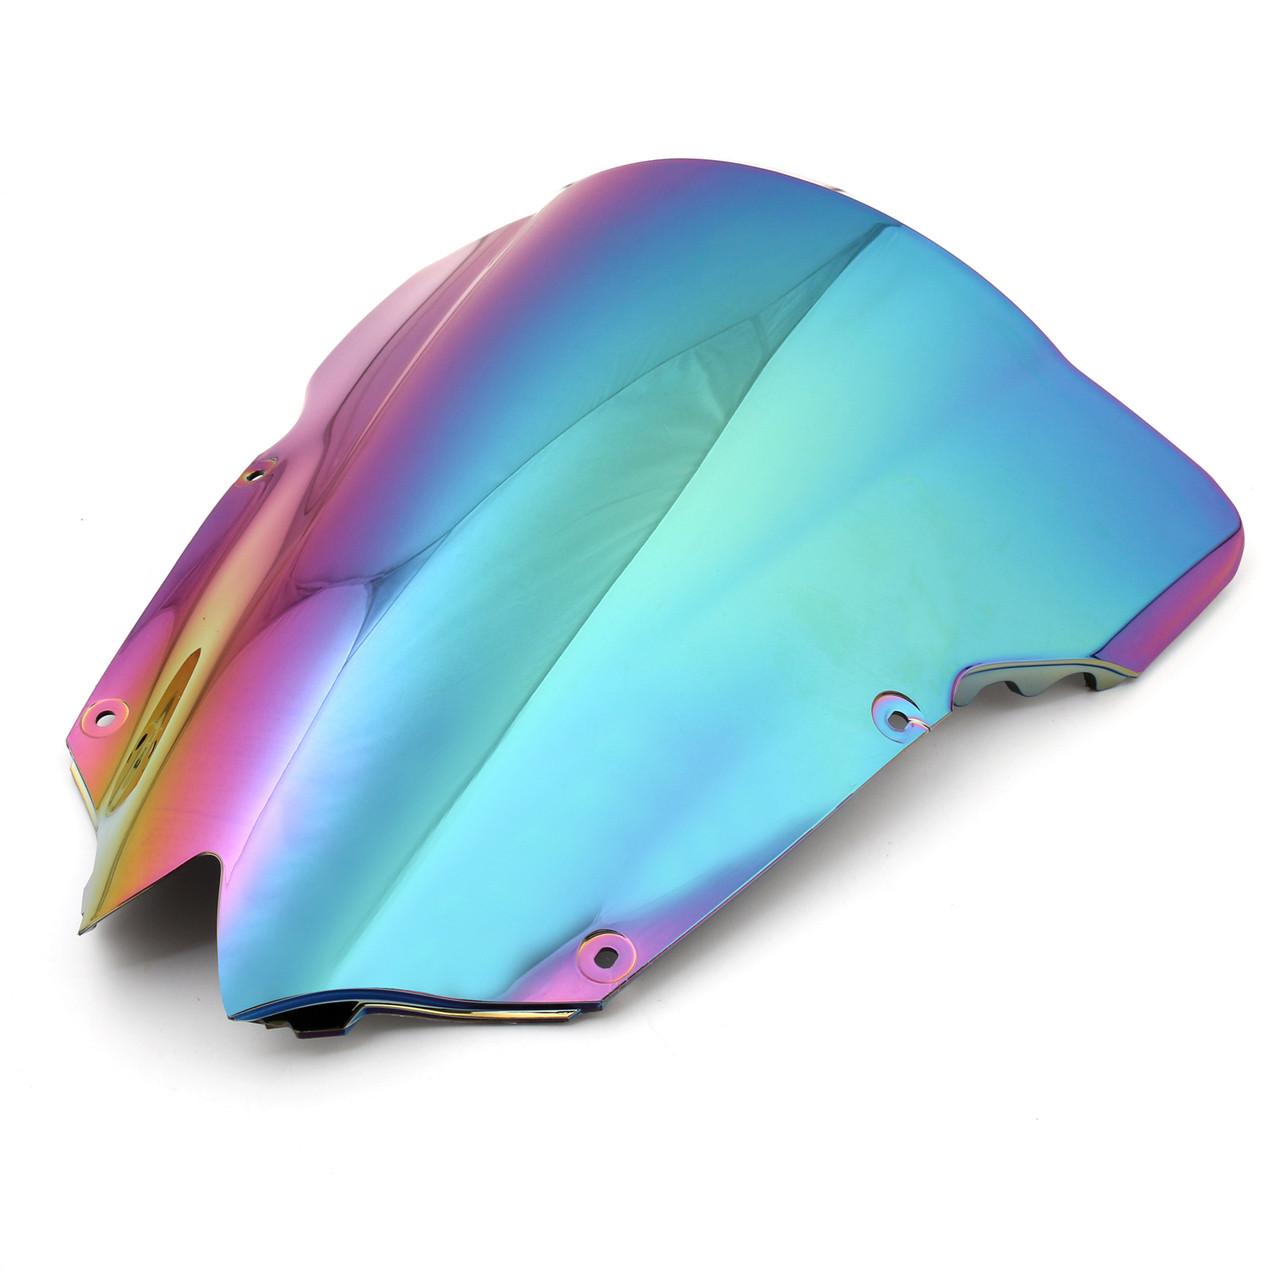 http://www.madhornets.store/AMZ/MotoPart/Windshield/Yamaha/WIN-Y406/WIN-Y406-Iridium-2.jpg